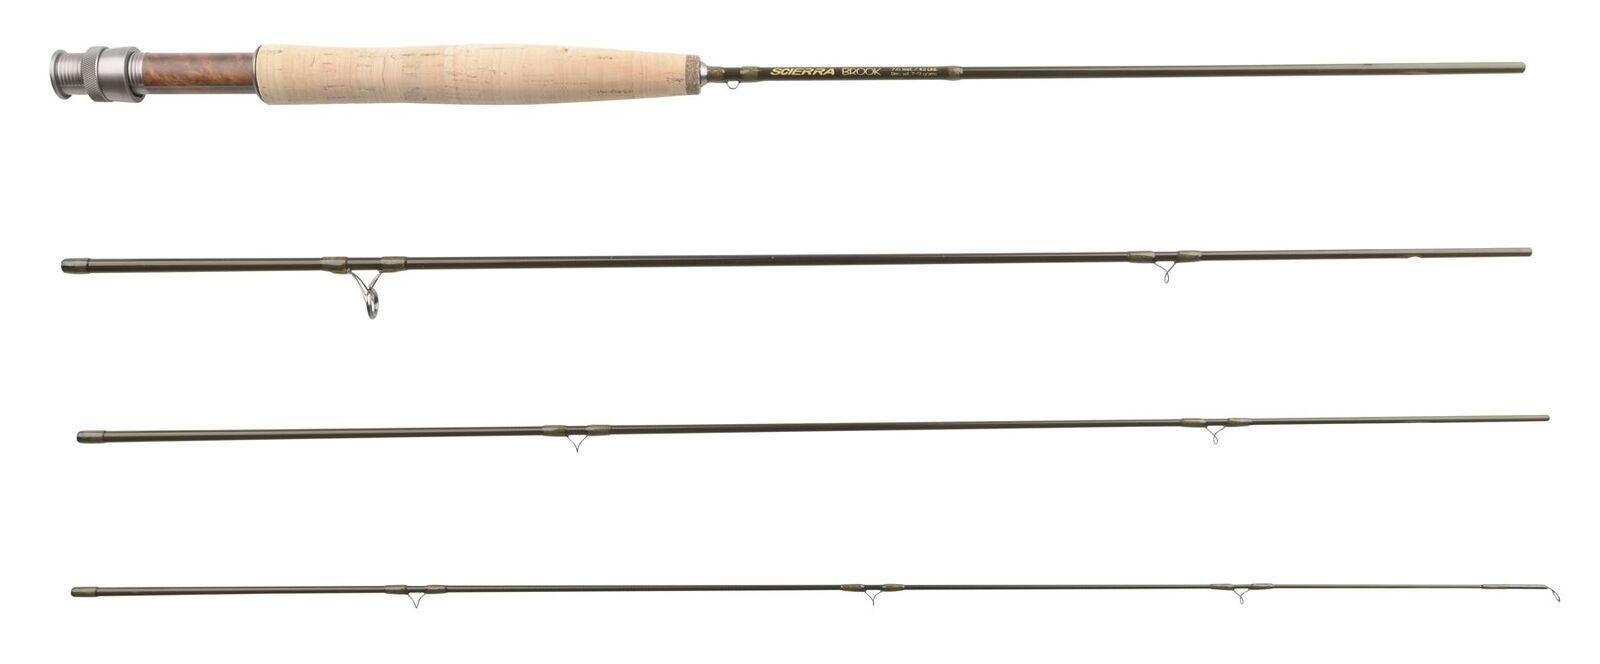 Scierra Brook 7' sec Rec. Wt. 5-7g  rod (Fly Fishing Fishing)  popular